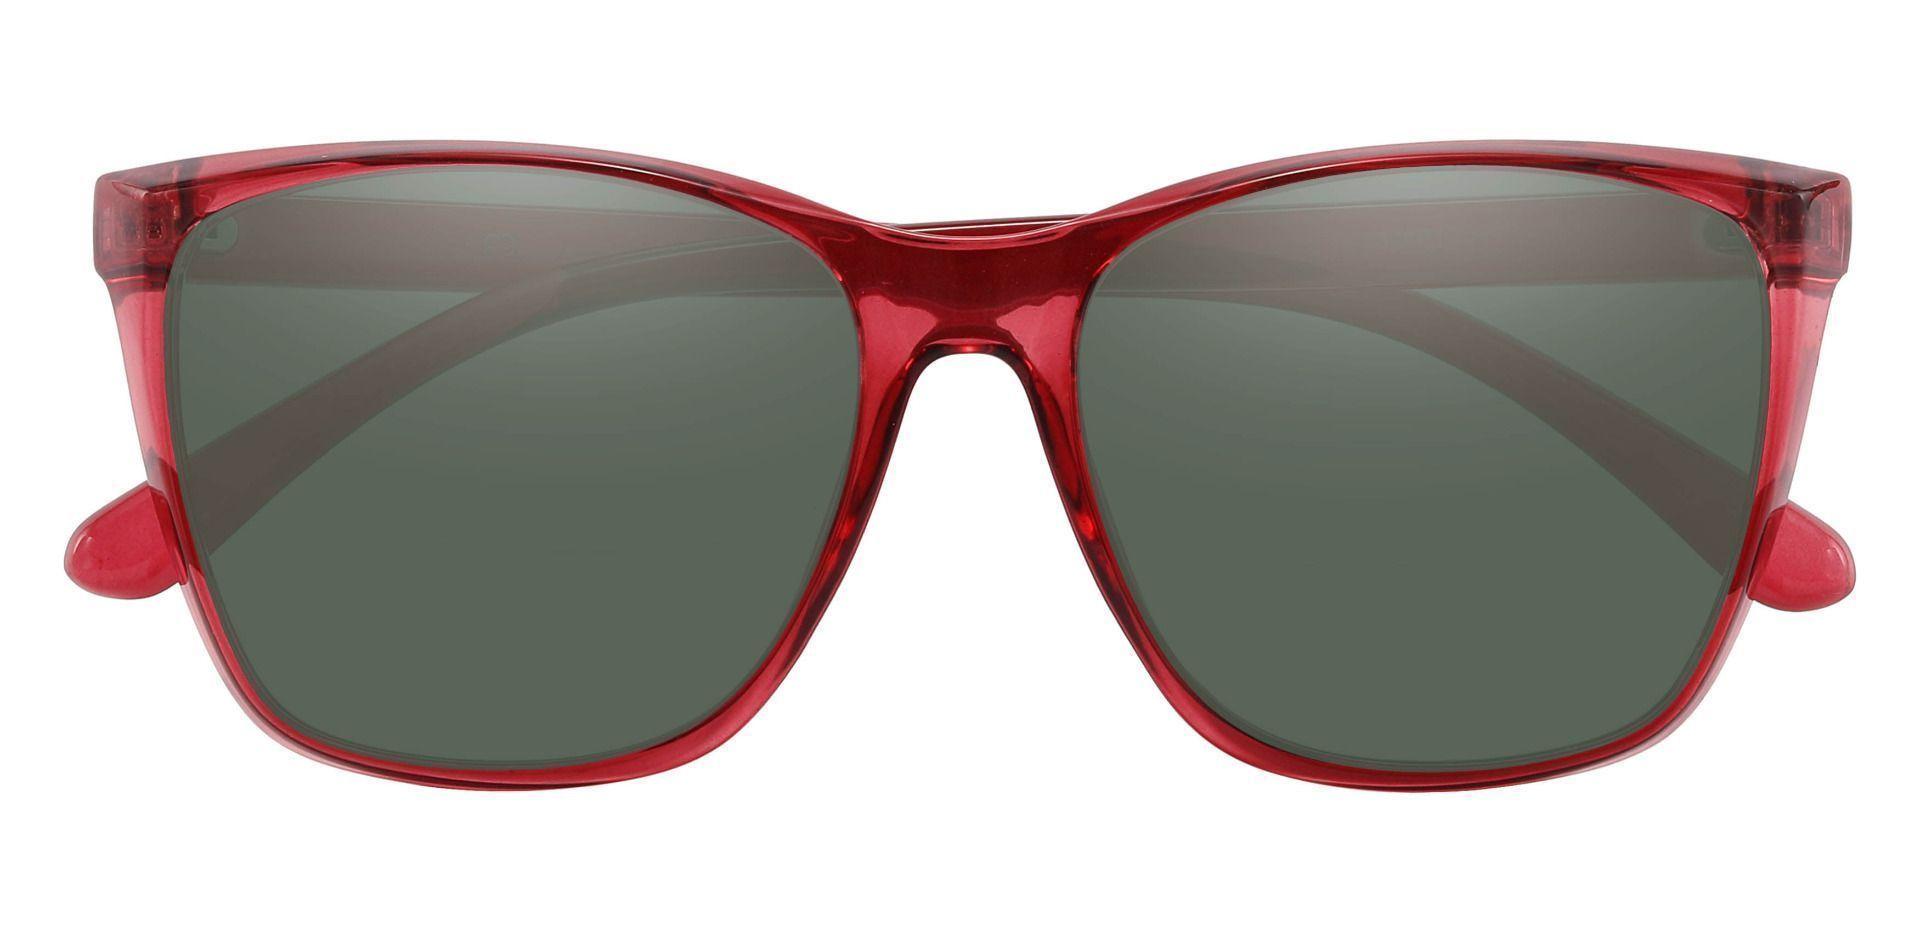 Taryn Square Prescription Sunglasses - Red Frame With Green Lenses